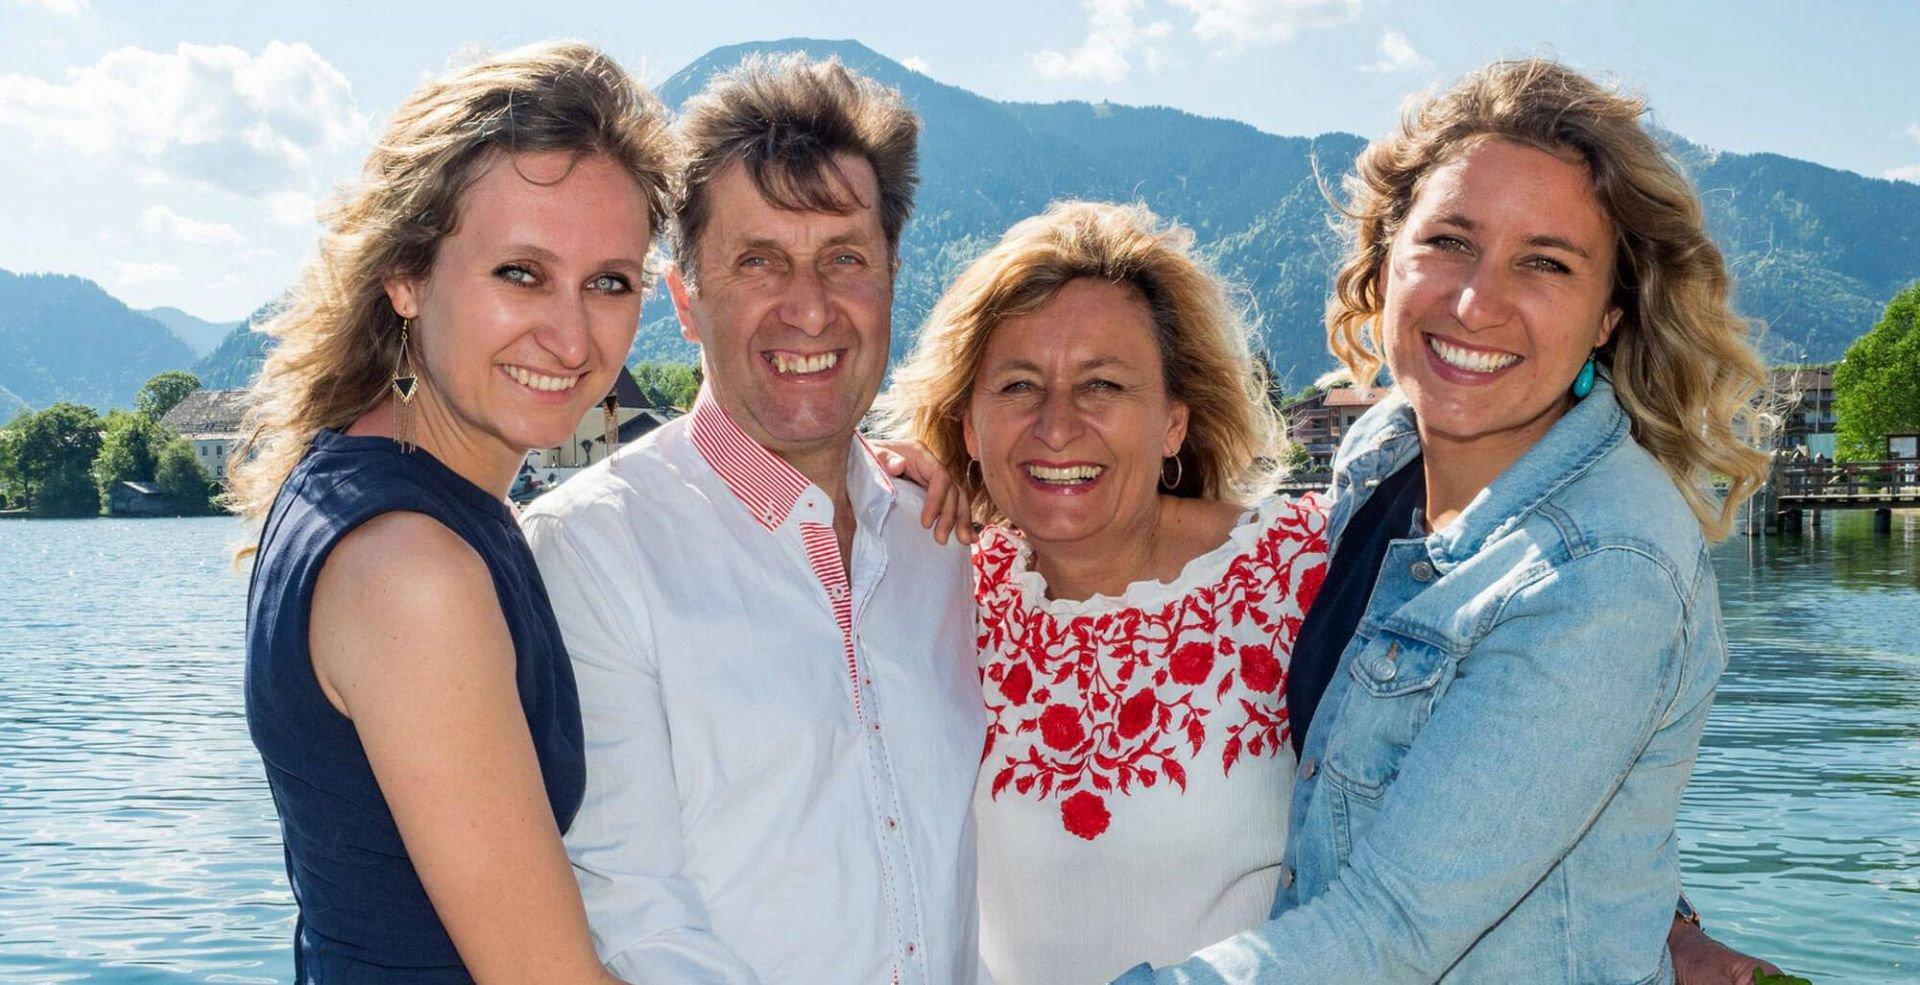 Family Goller - Gemangerhof Meluno